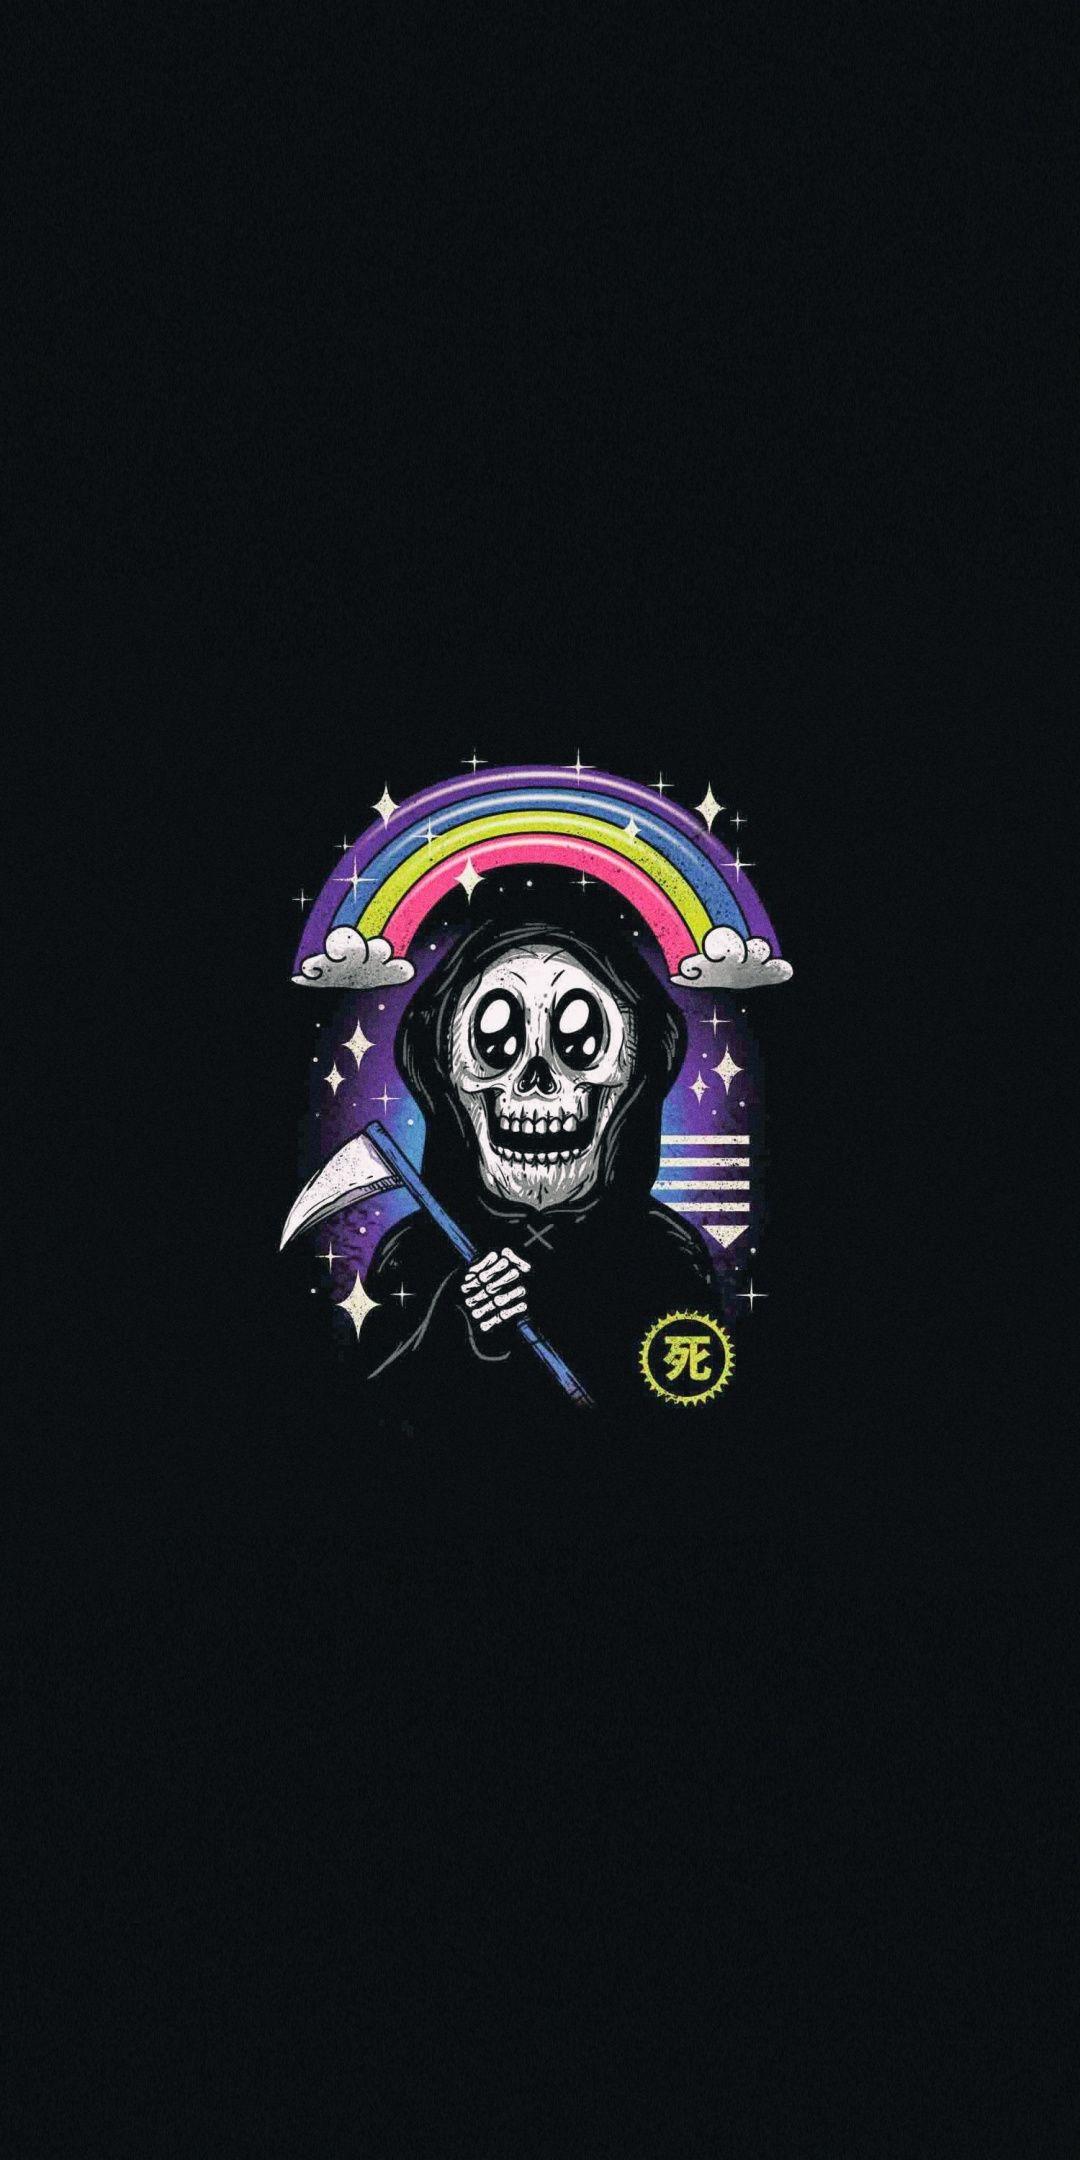 Happy, Grim Reaper, minimal, art, 1080x2160 wallpaper